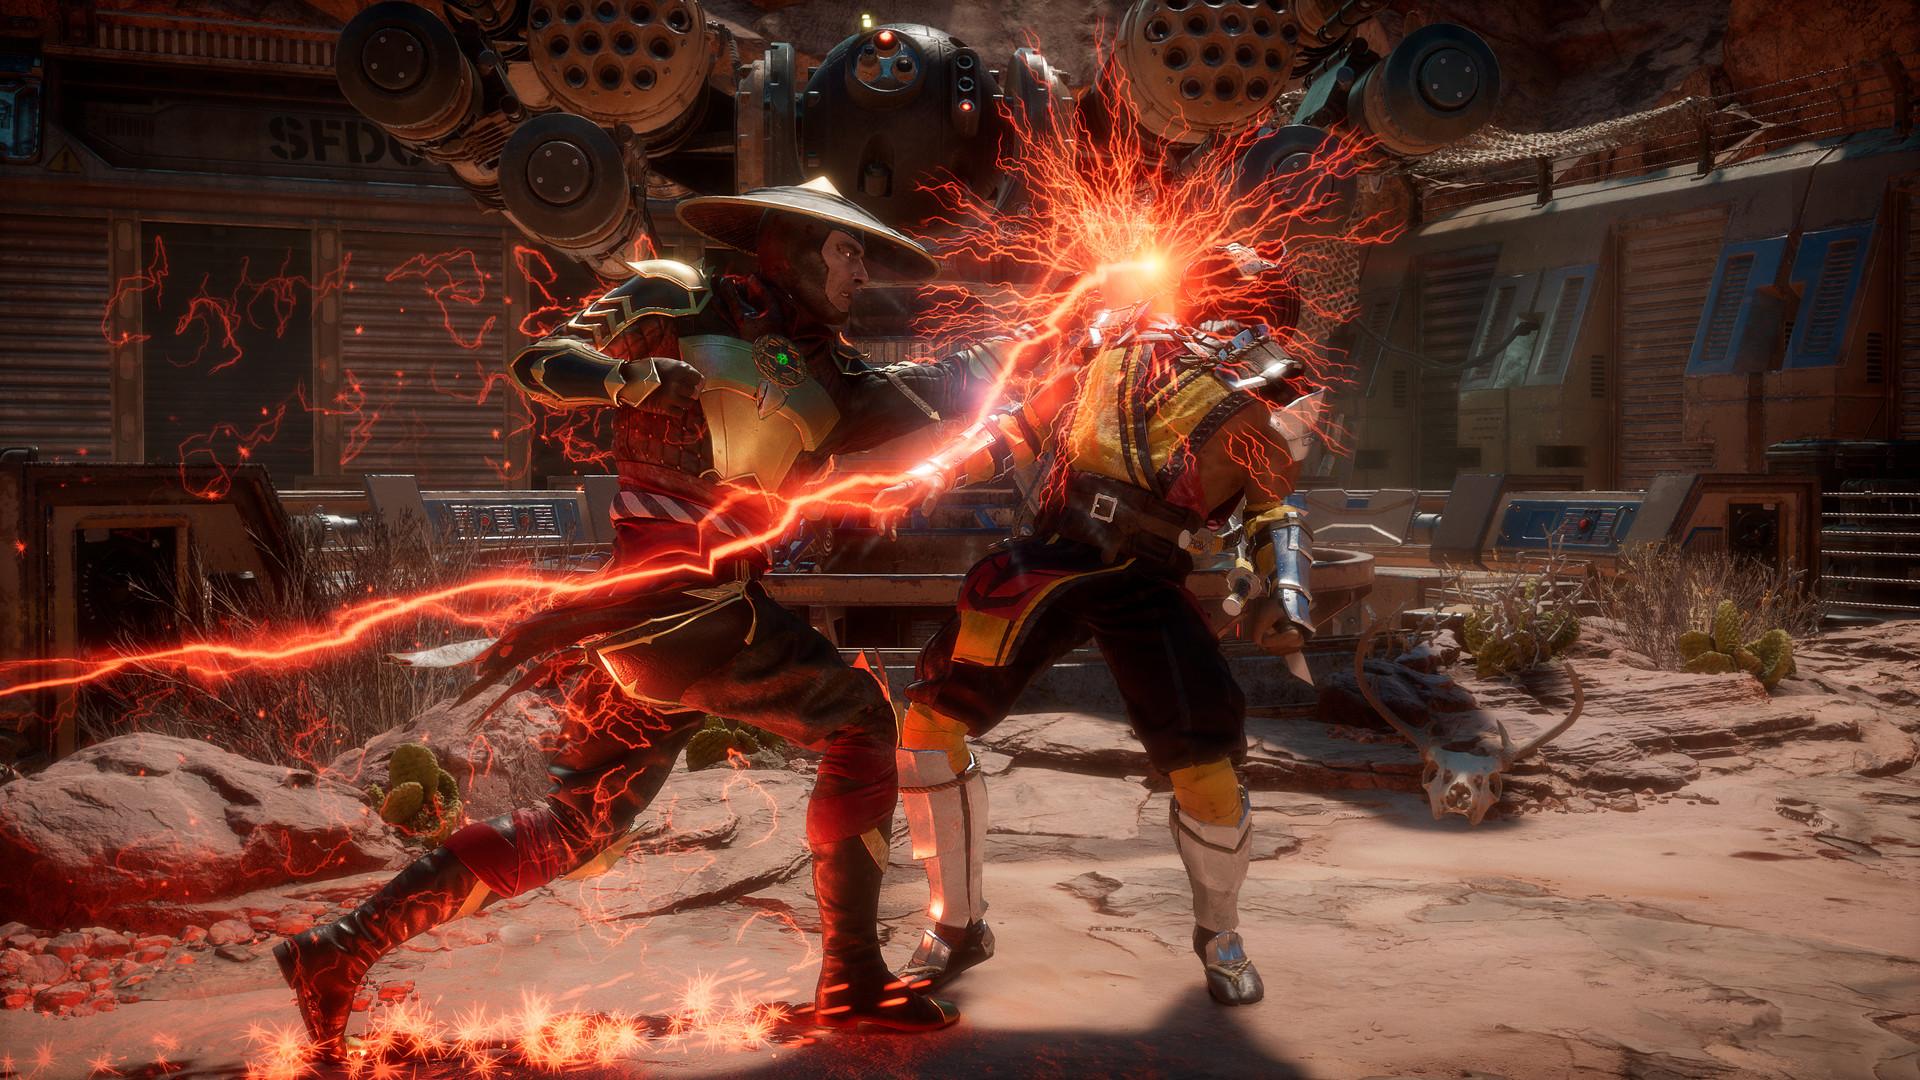 Mortal Kombat 11 เกมเดือด เลือดกระจาย (1)